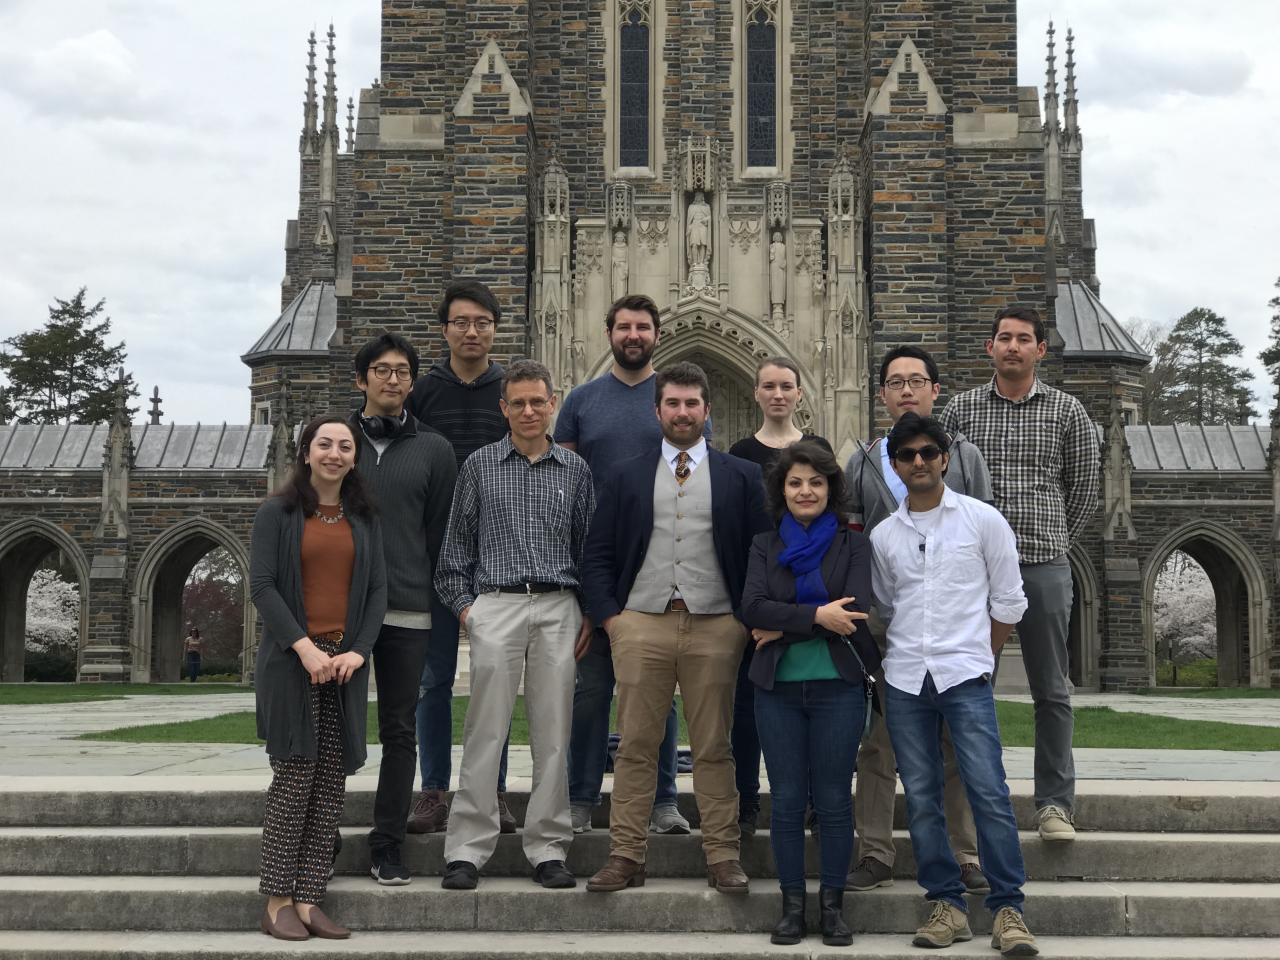 Mitzi group photo - post Wiley defense